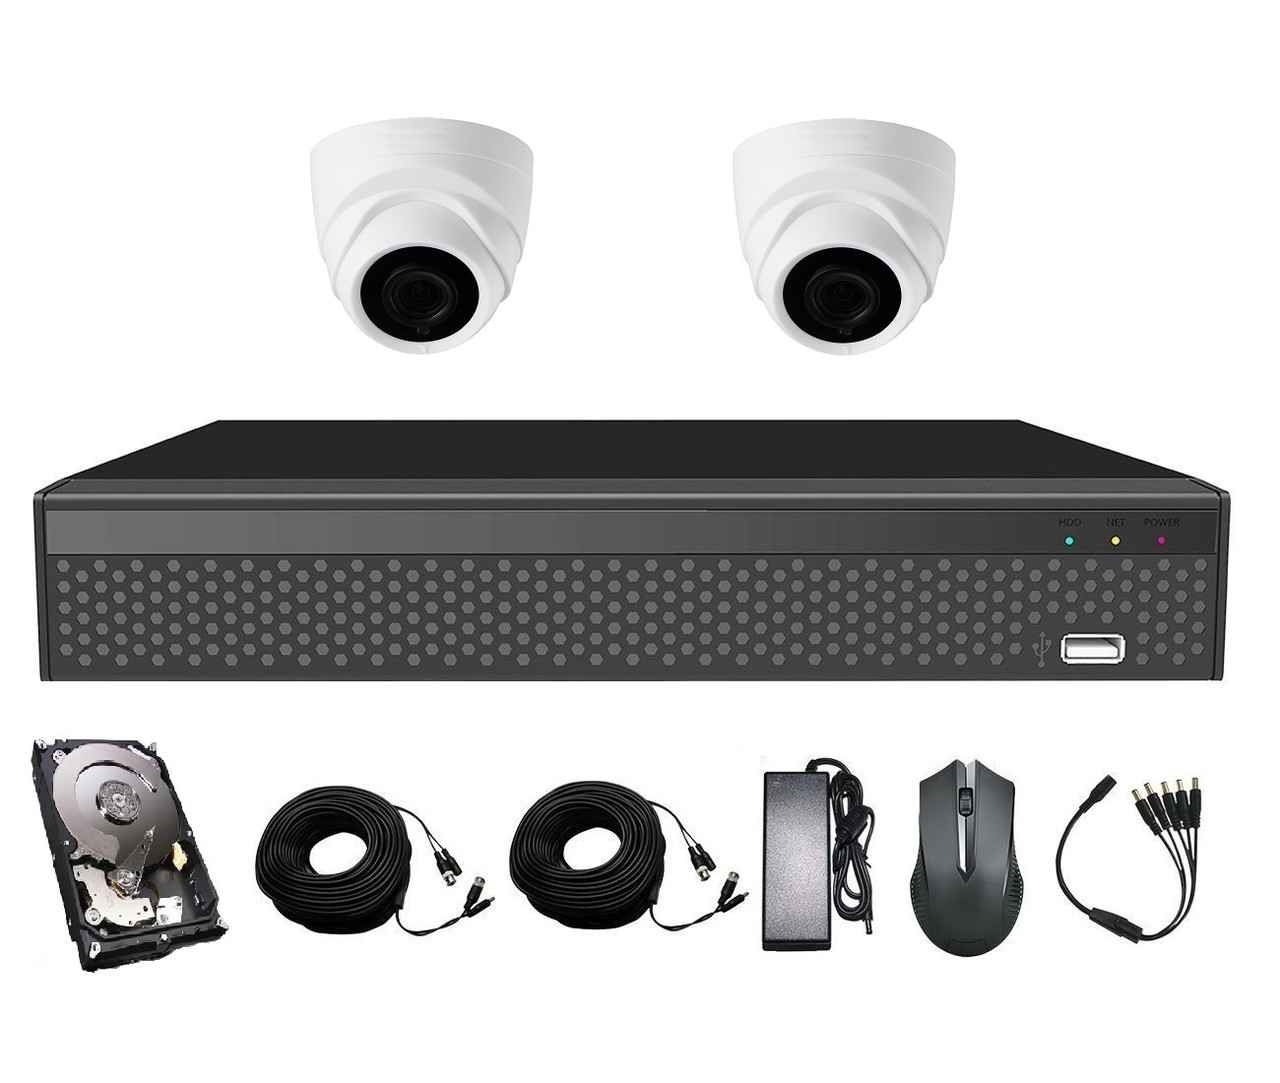 Комплект видеонаблюдения CoVi Security AHD-2D 5MP MasterKit + HDD500